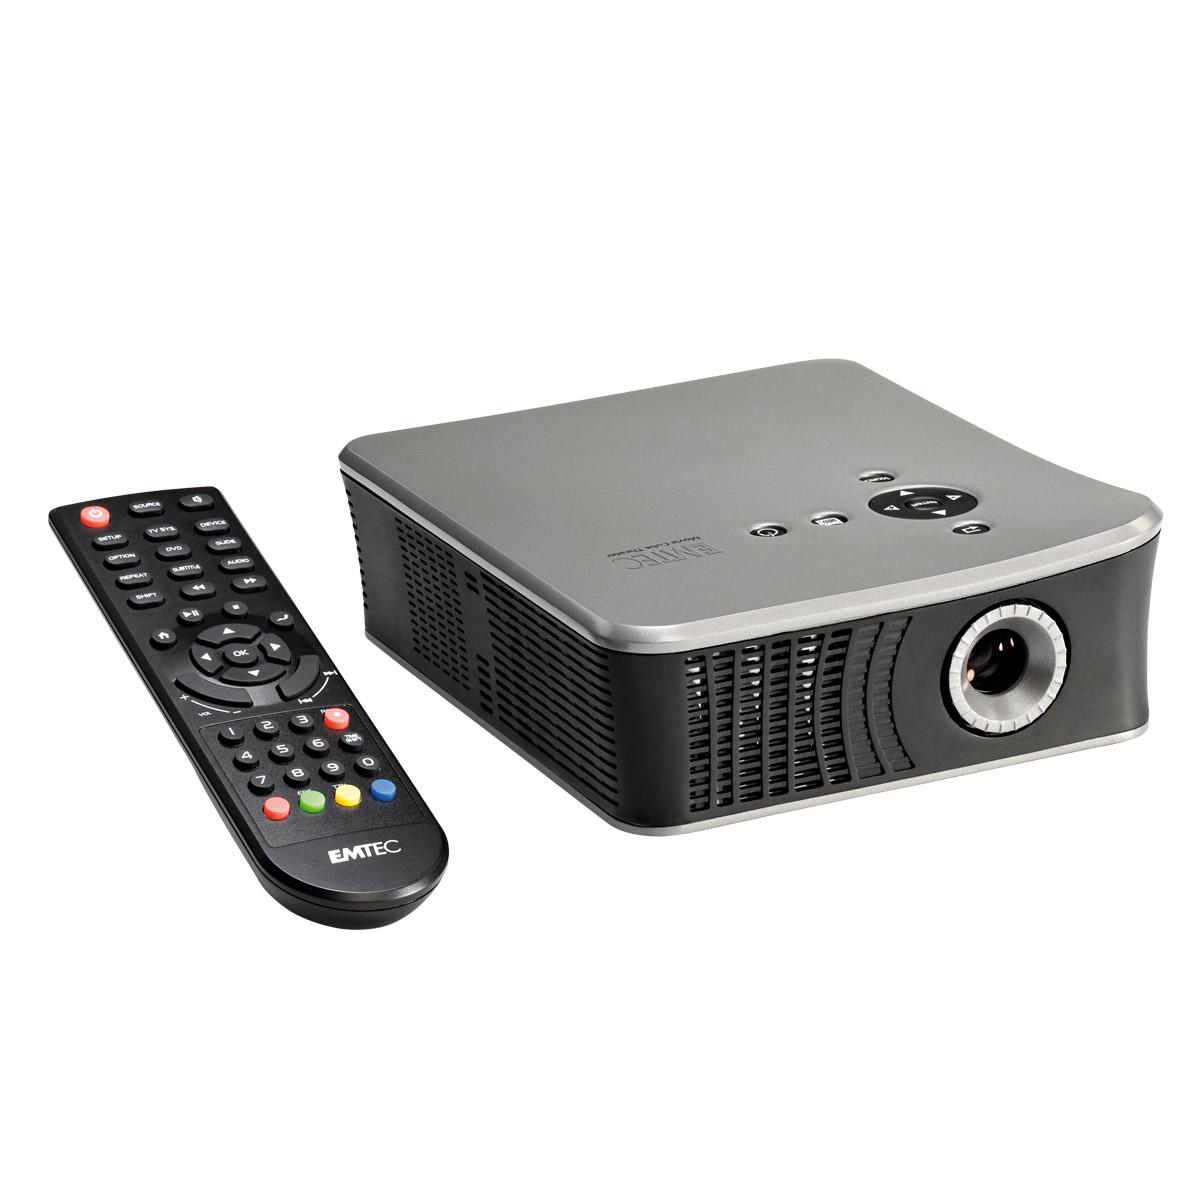 videoprojecteur tnt integre videoprojecteur tnt integre sur enperdresonlapin. Black Bedroom Furniture Sets. Home Design Ideas